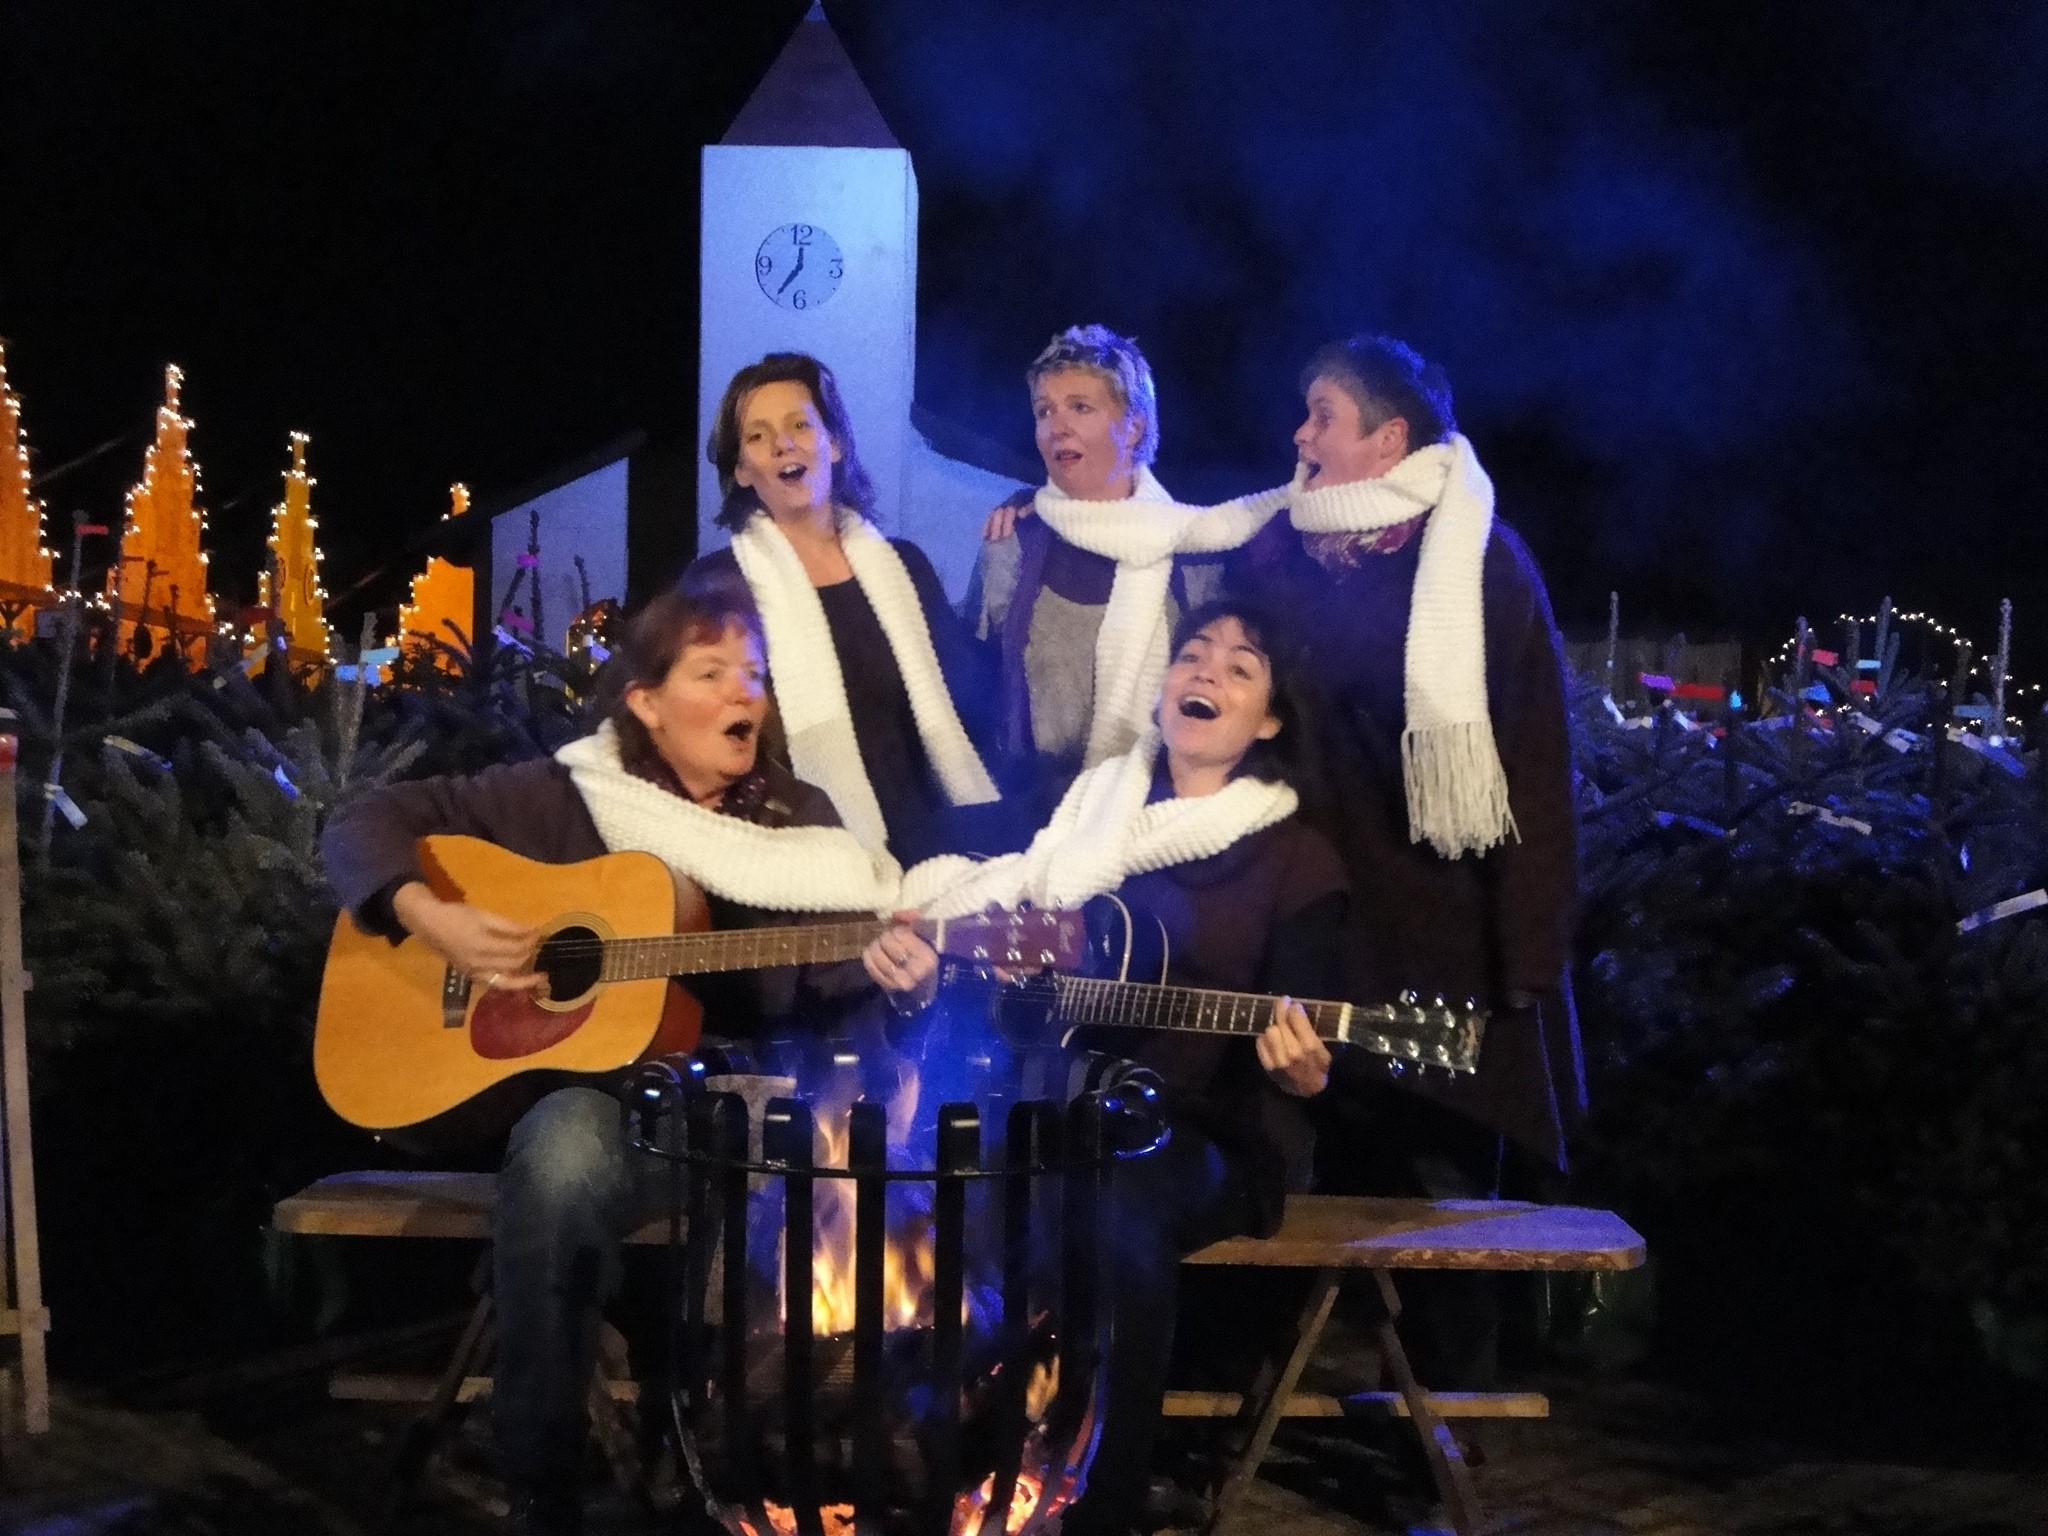 kerst Vaarderhoogt Soest 2009